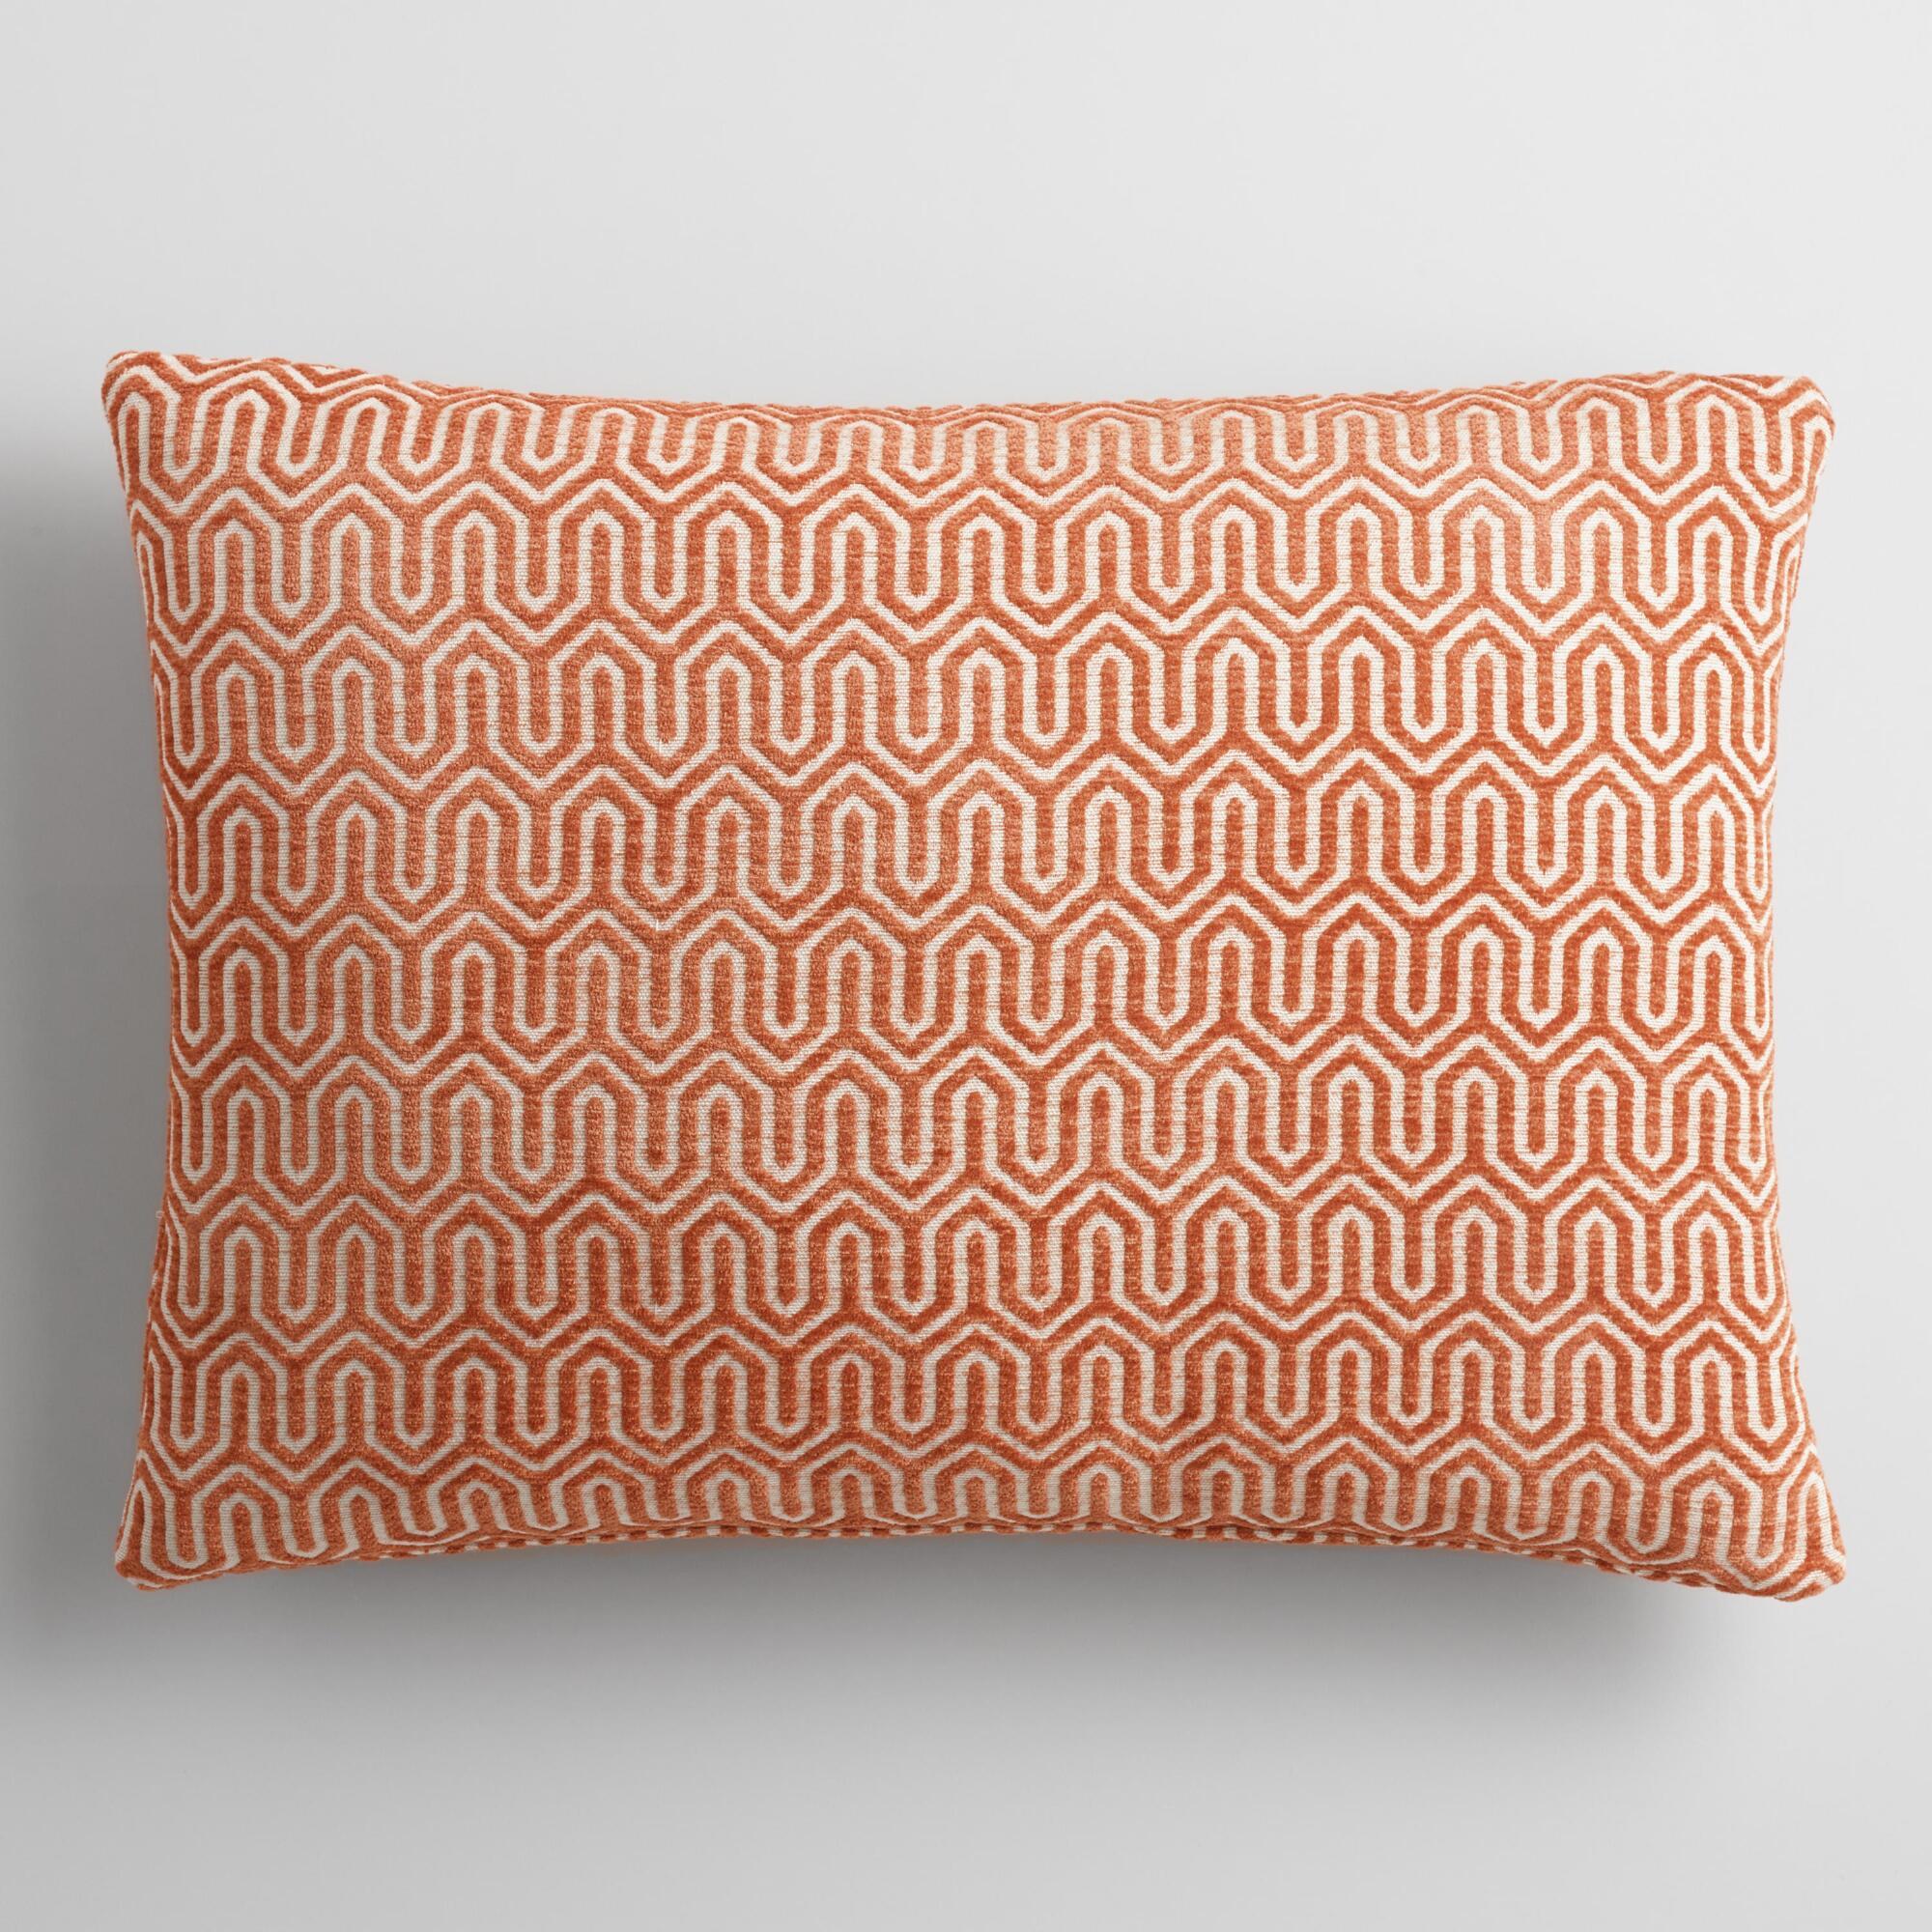 rust geo chenille lumbar pillow orange polyester by world market world market cost plus